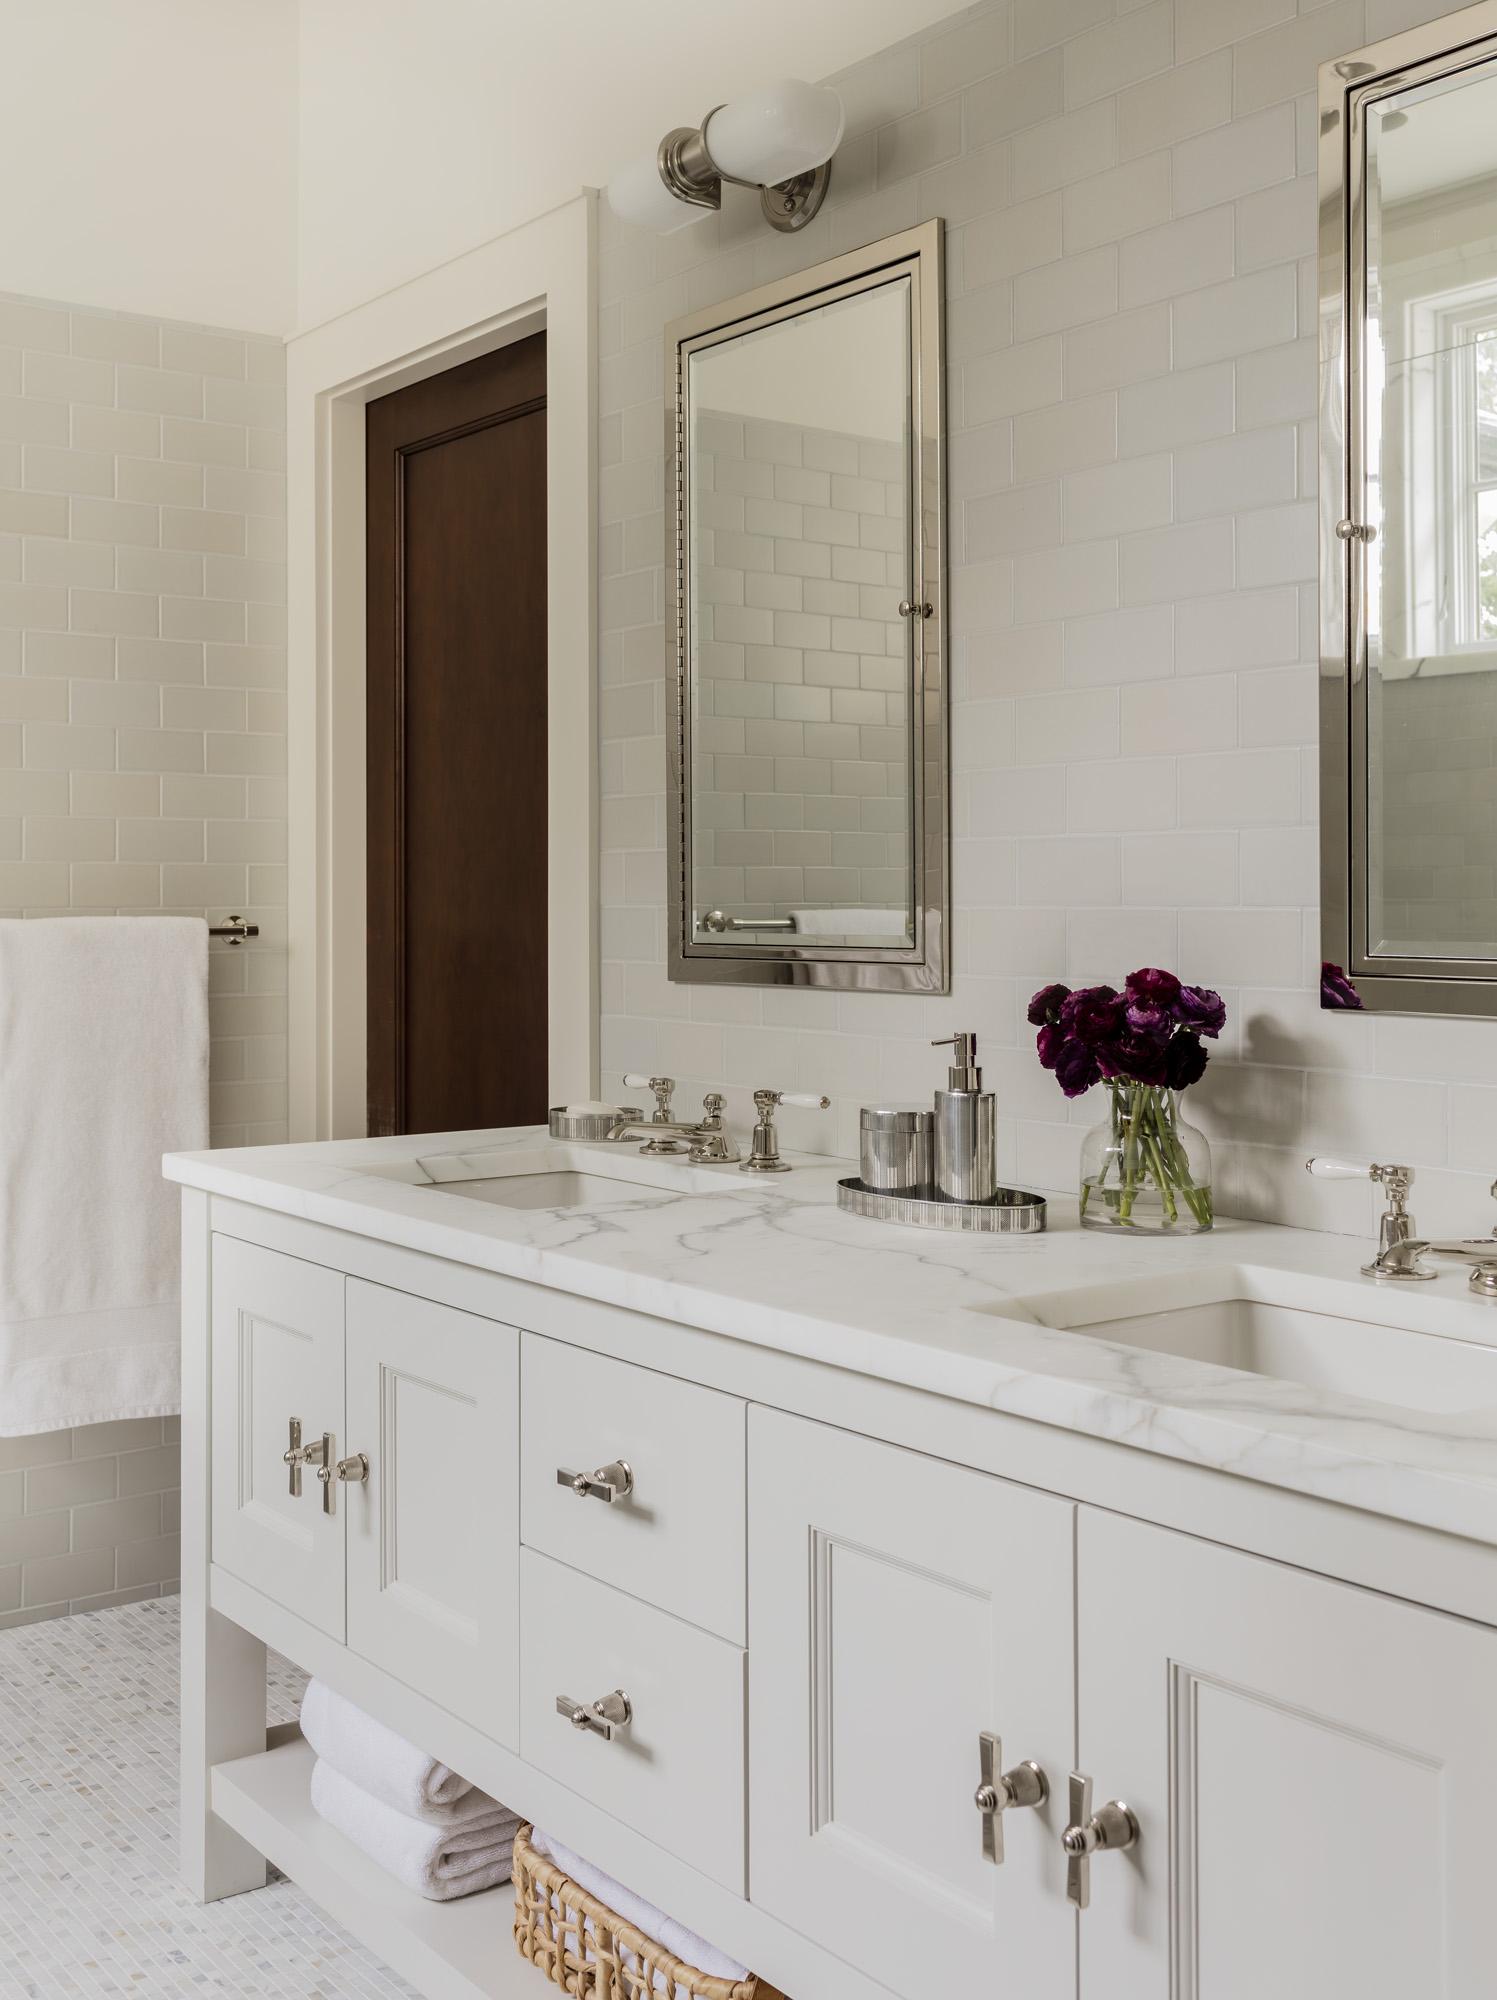 Luxurious Bathroom Retreats Featuring Waterworks Chairish Blog